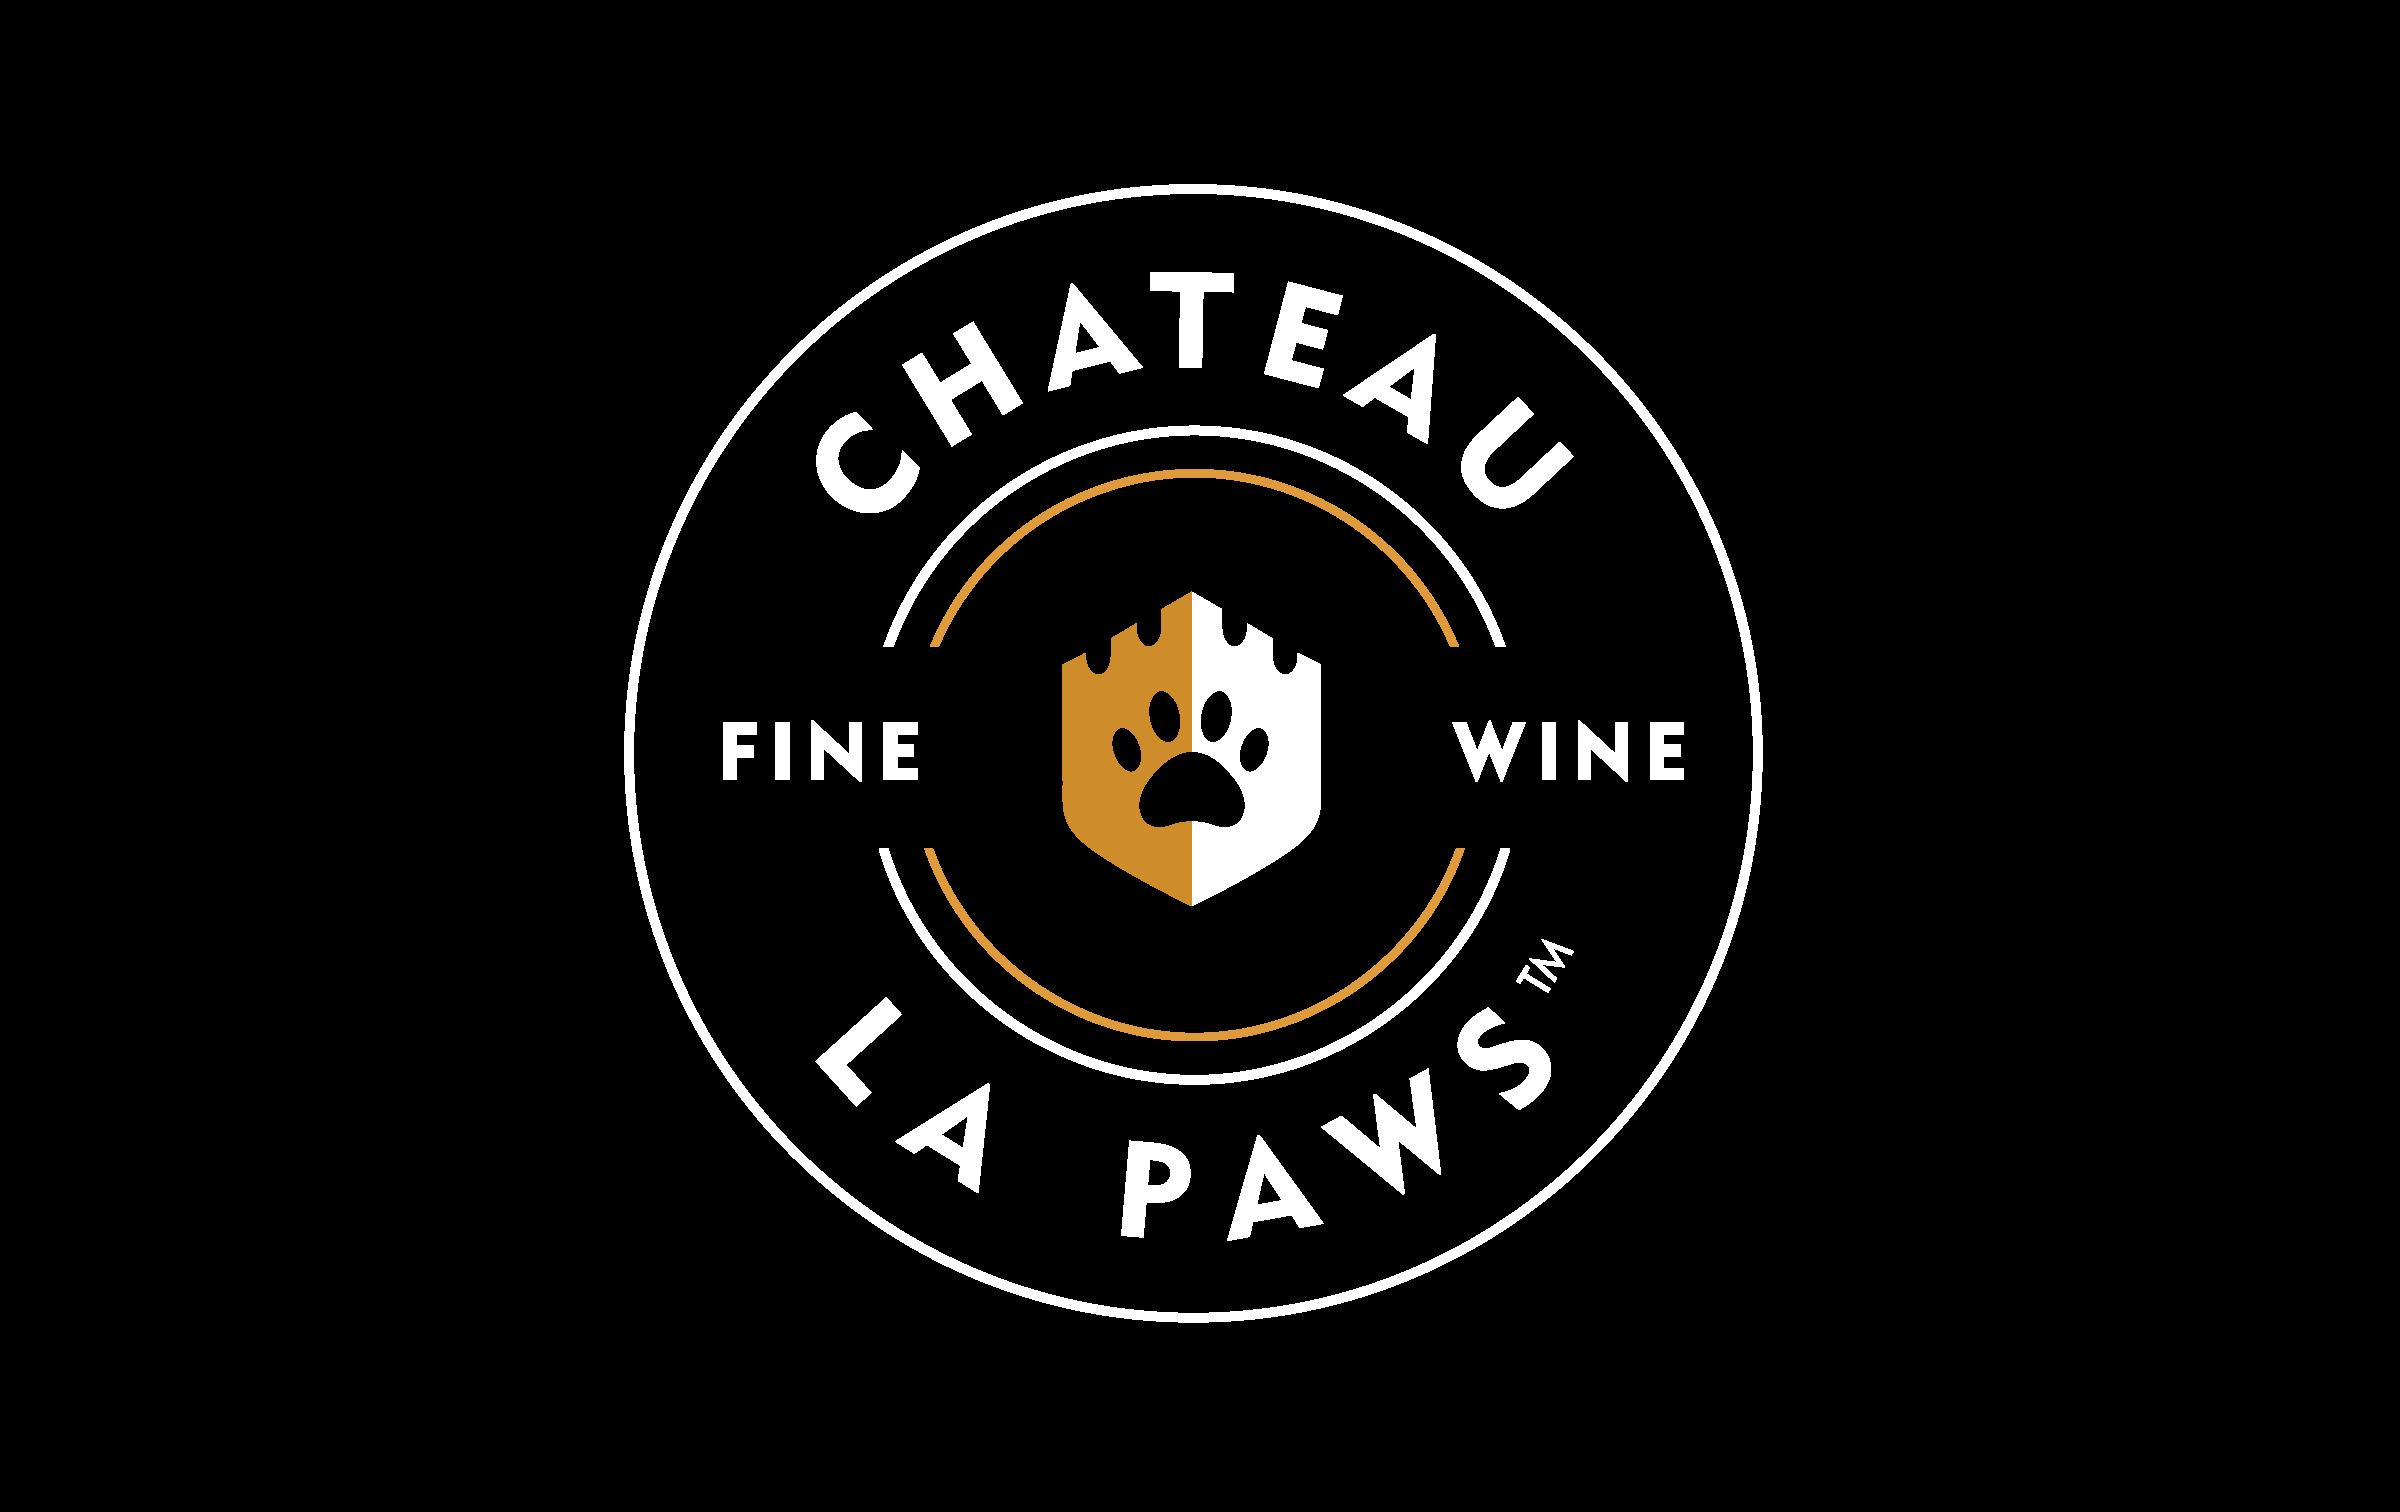 Chateau La Paws Logo design